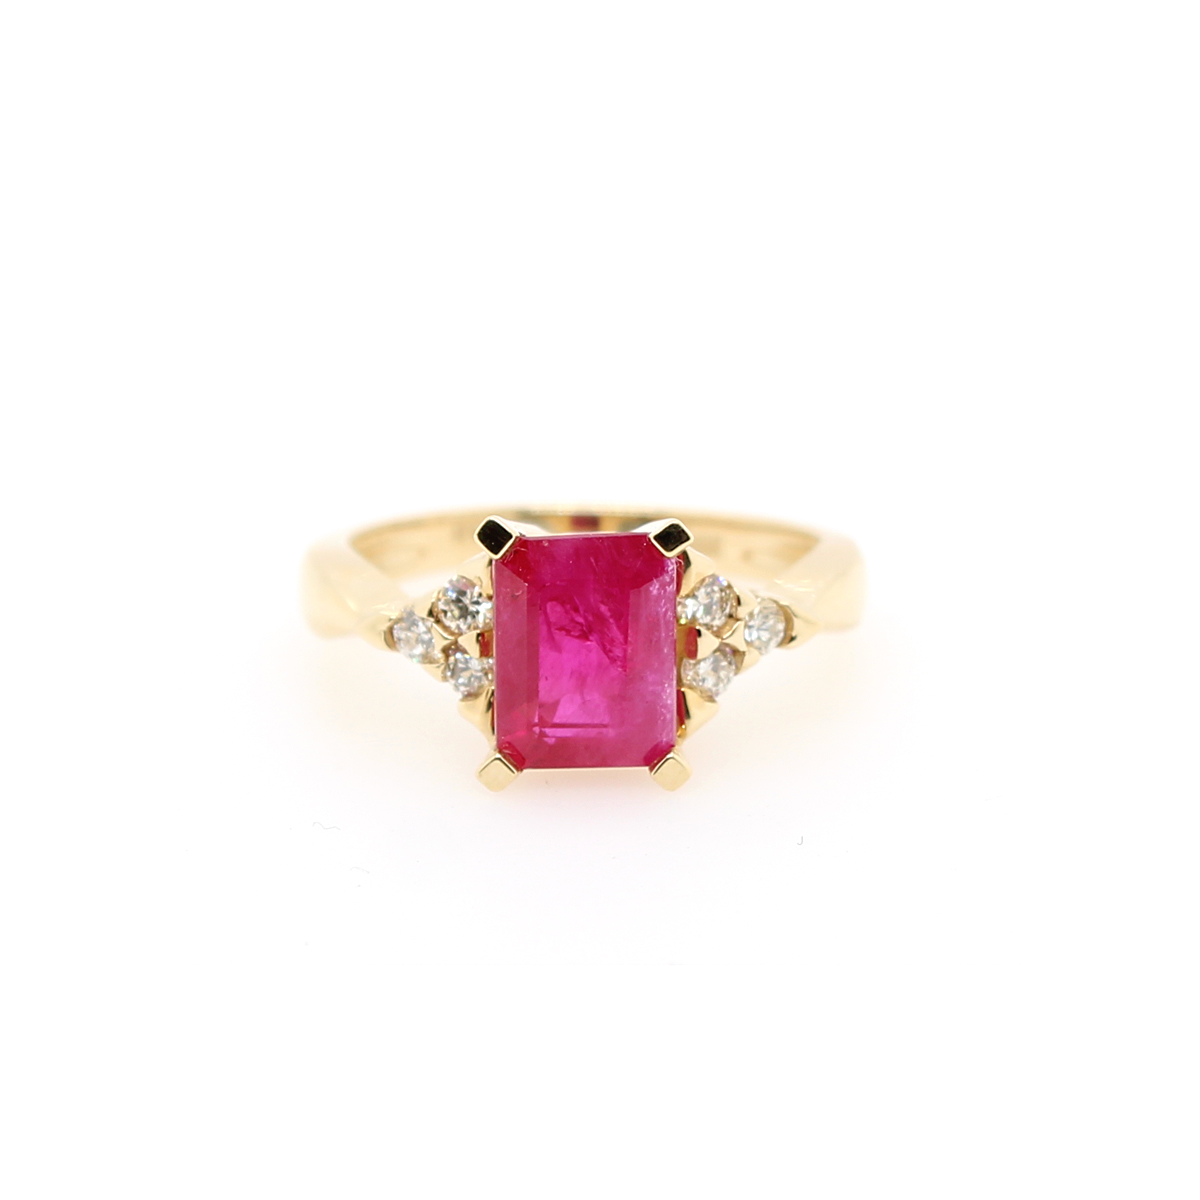 Ryan Gems 14 Karat Yellow Gold Emerald Cut Ruby and Diamond ring